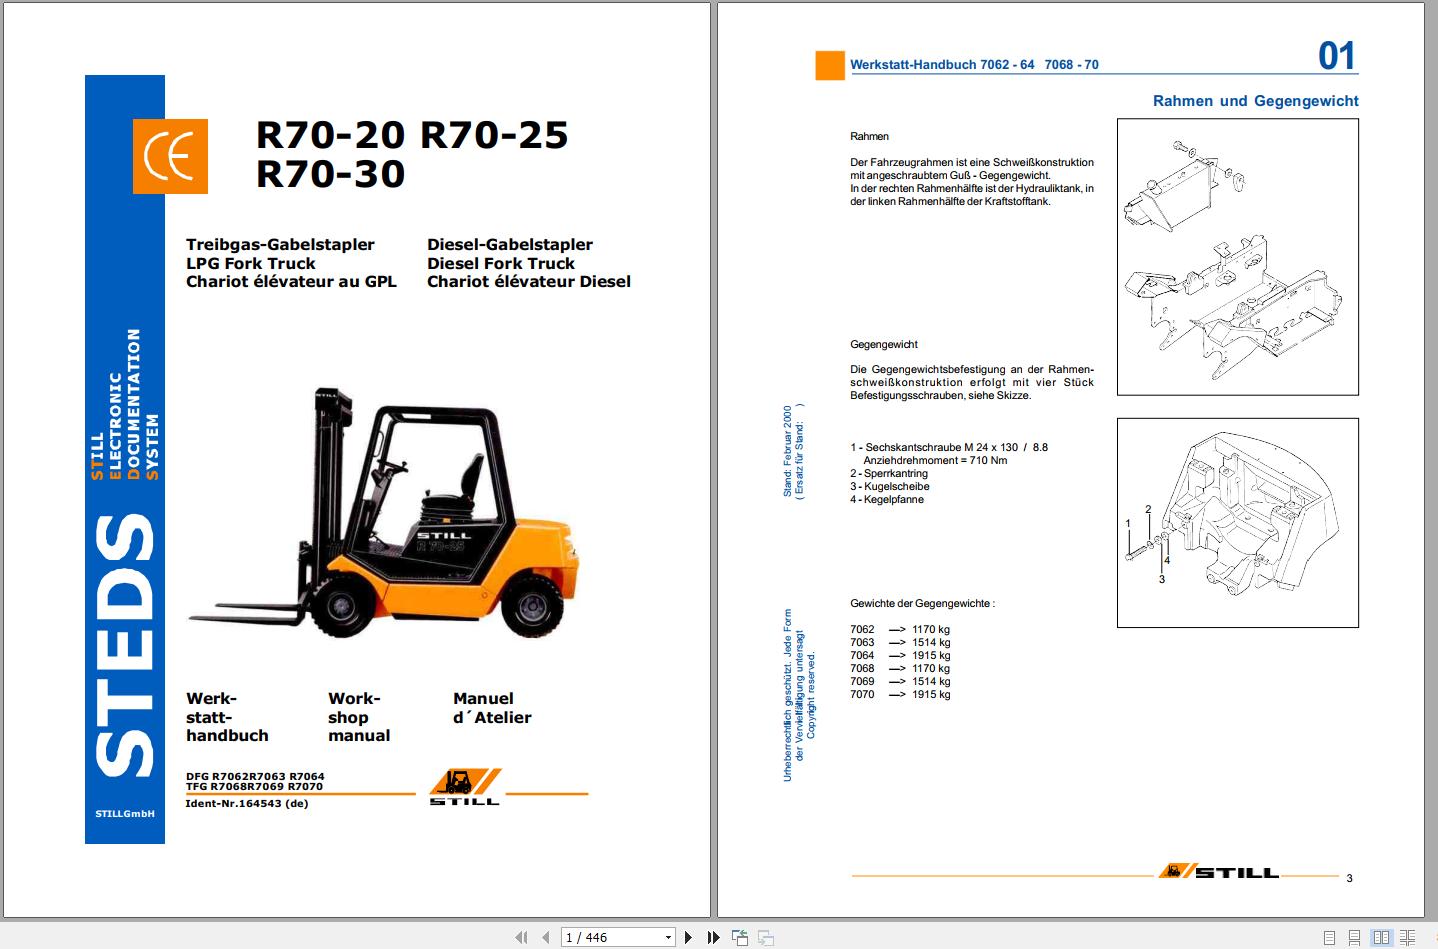 Still Sted Forklift 21 3 Gb Pdf Update 2020 German